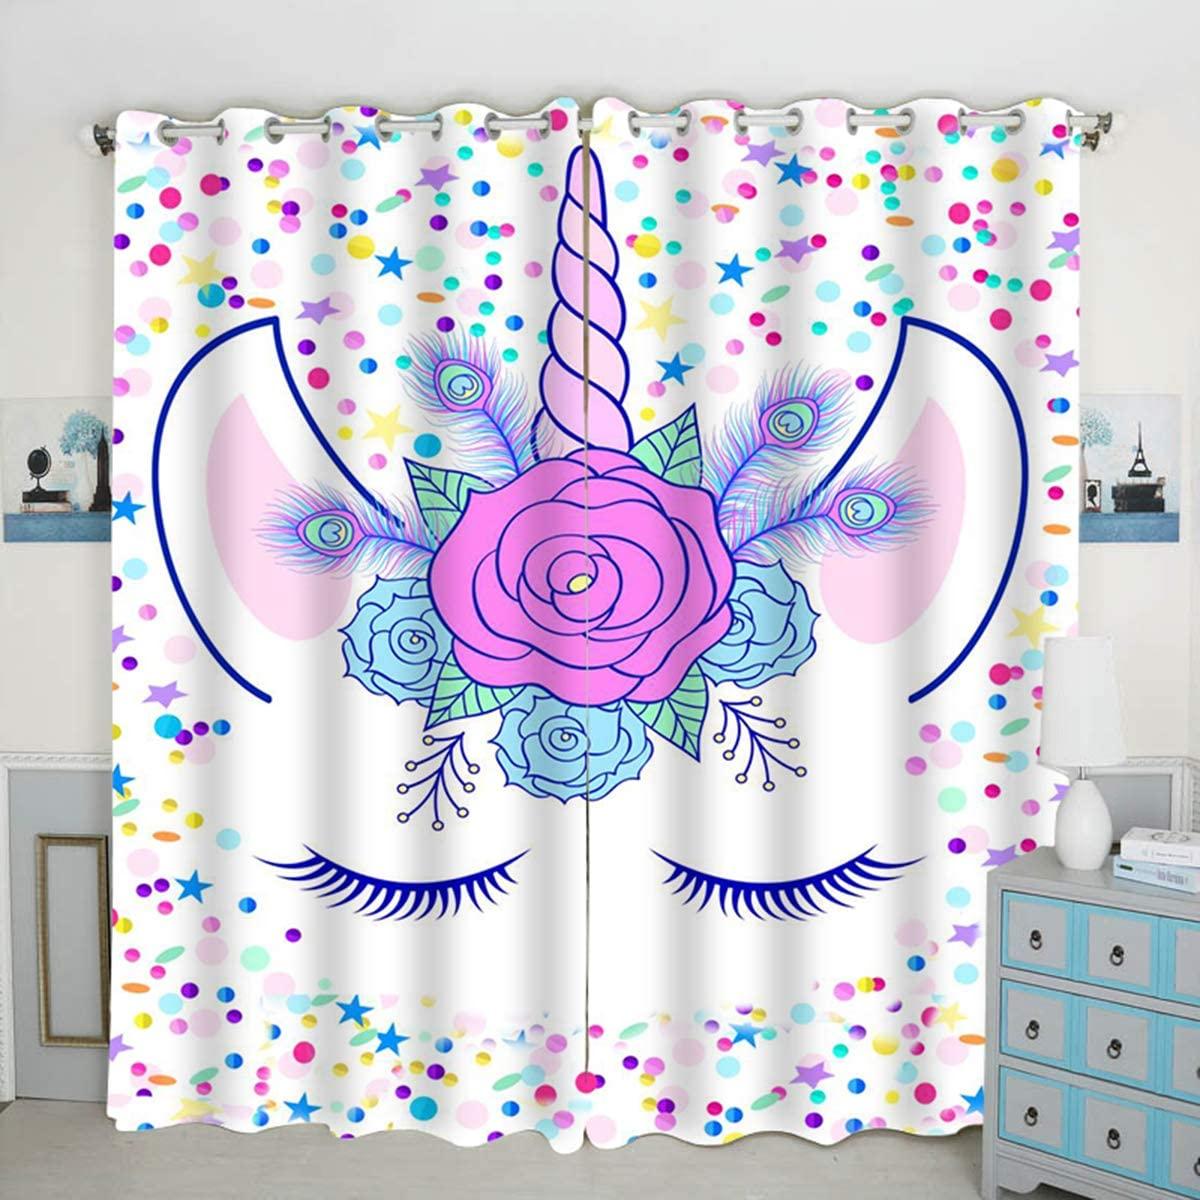 QH Unicorn & Stars Window Curtain Panels Blackout Curtain Panels Thermal Insulated & Light Blocking 42W x 84L inch (Set of 2 Panels)